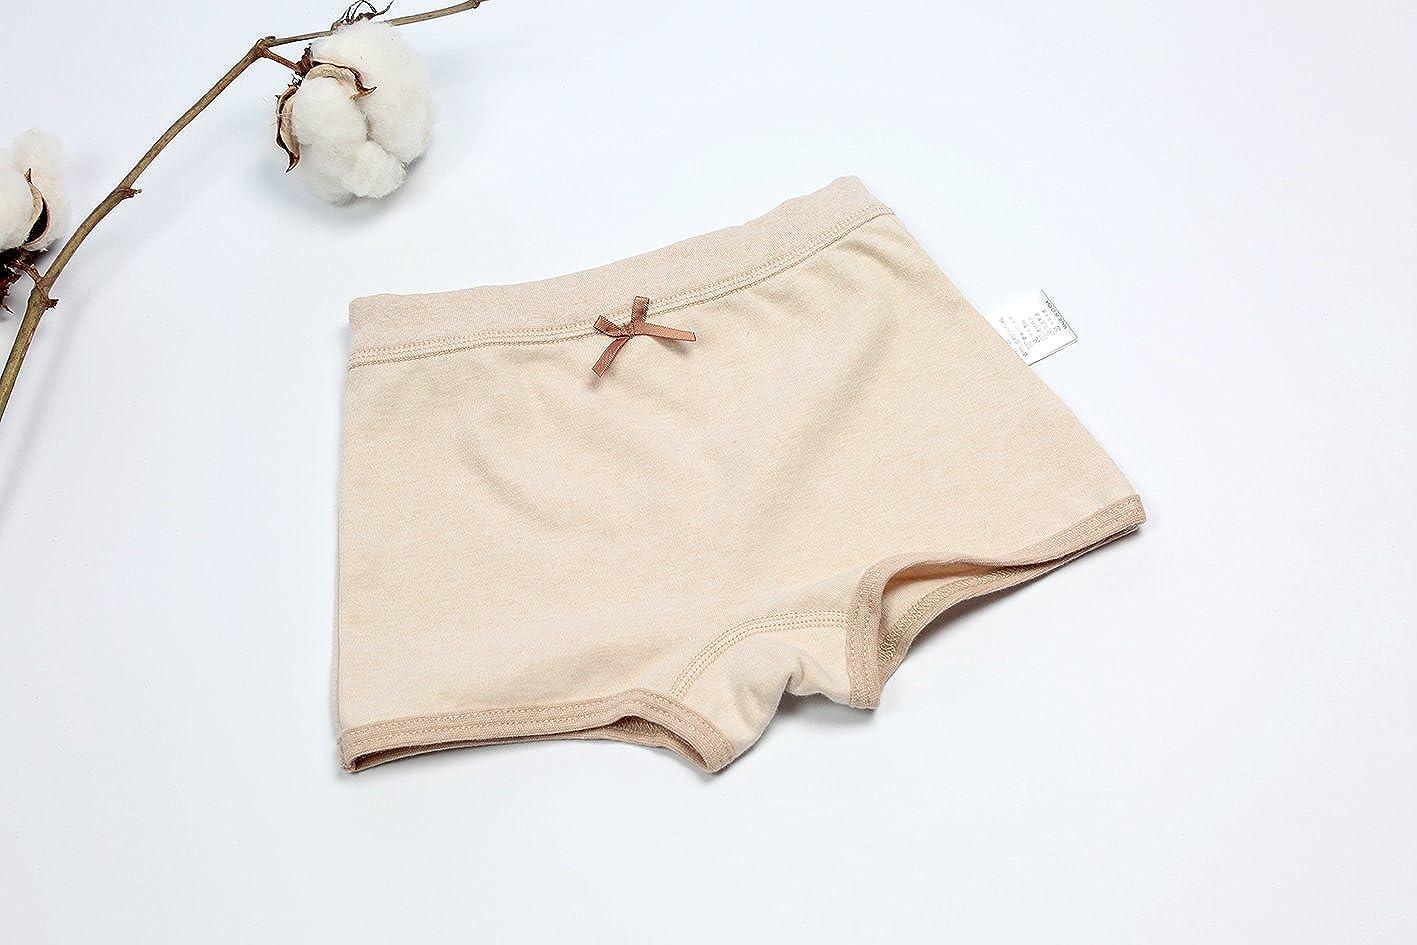 GZMM Girls Underwear Organic Cotton 3 Pack Kids Short Briefs Panties